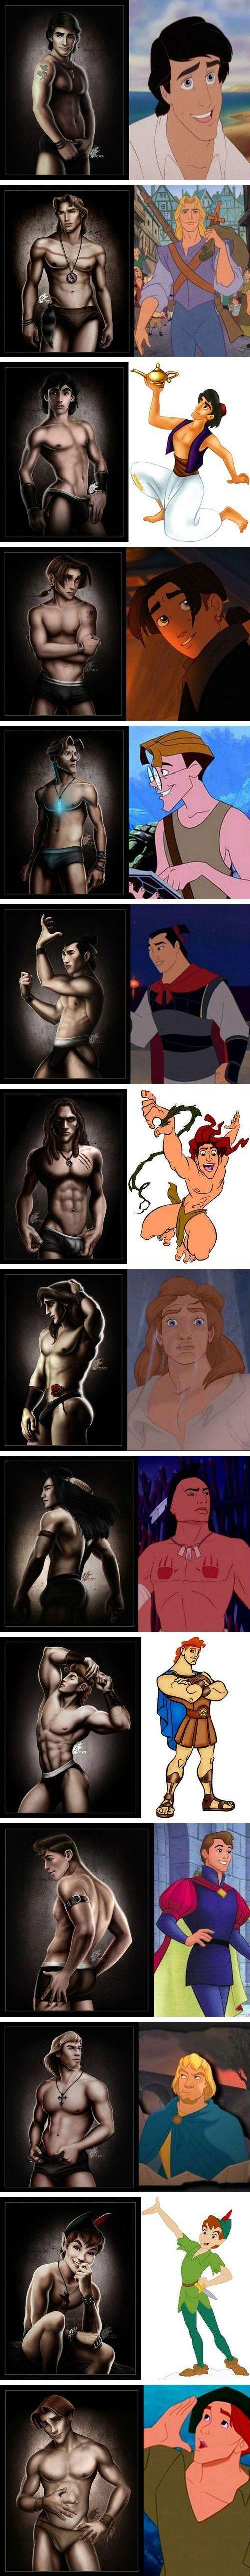 If Disney princes were underwear models.... wow.